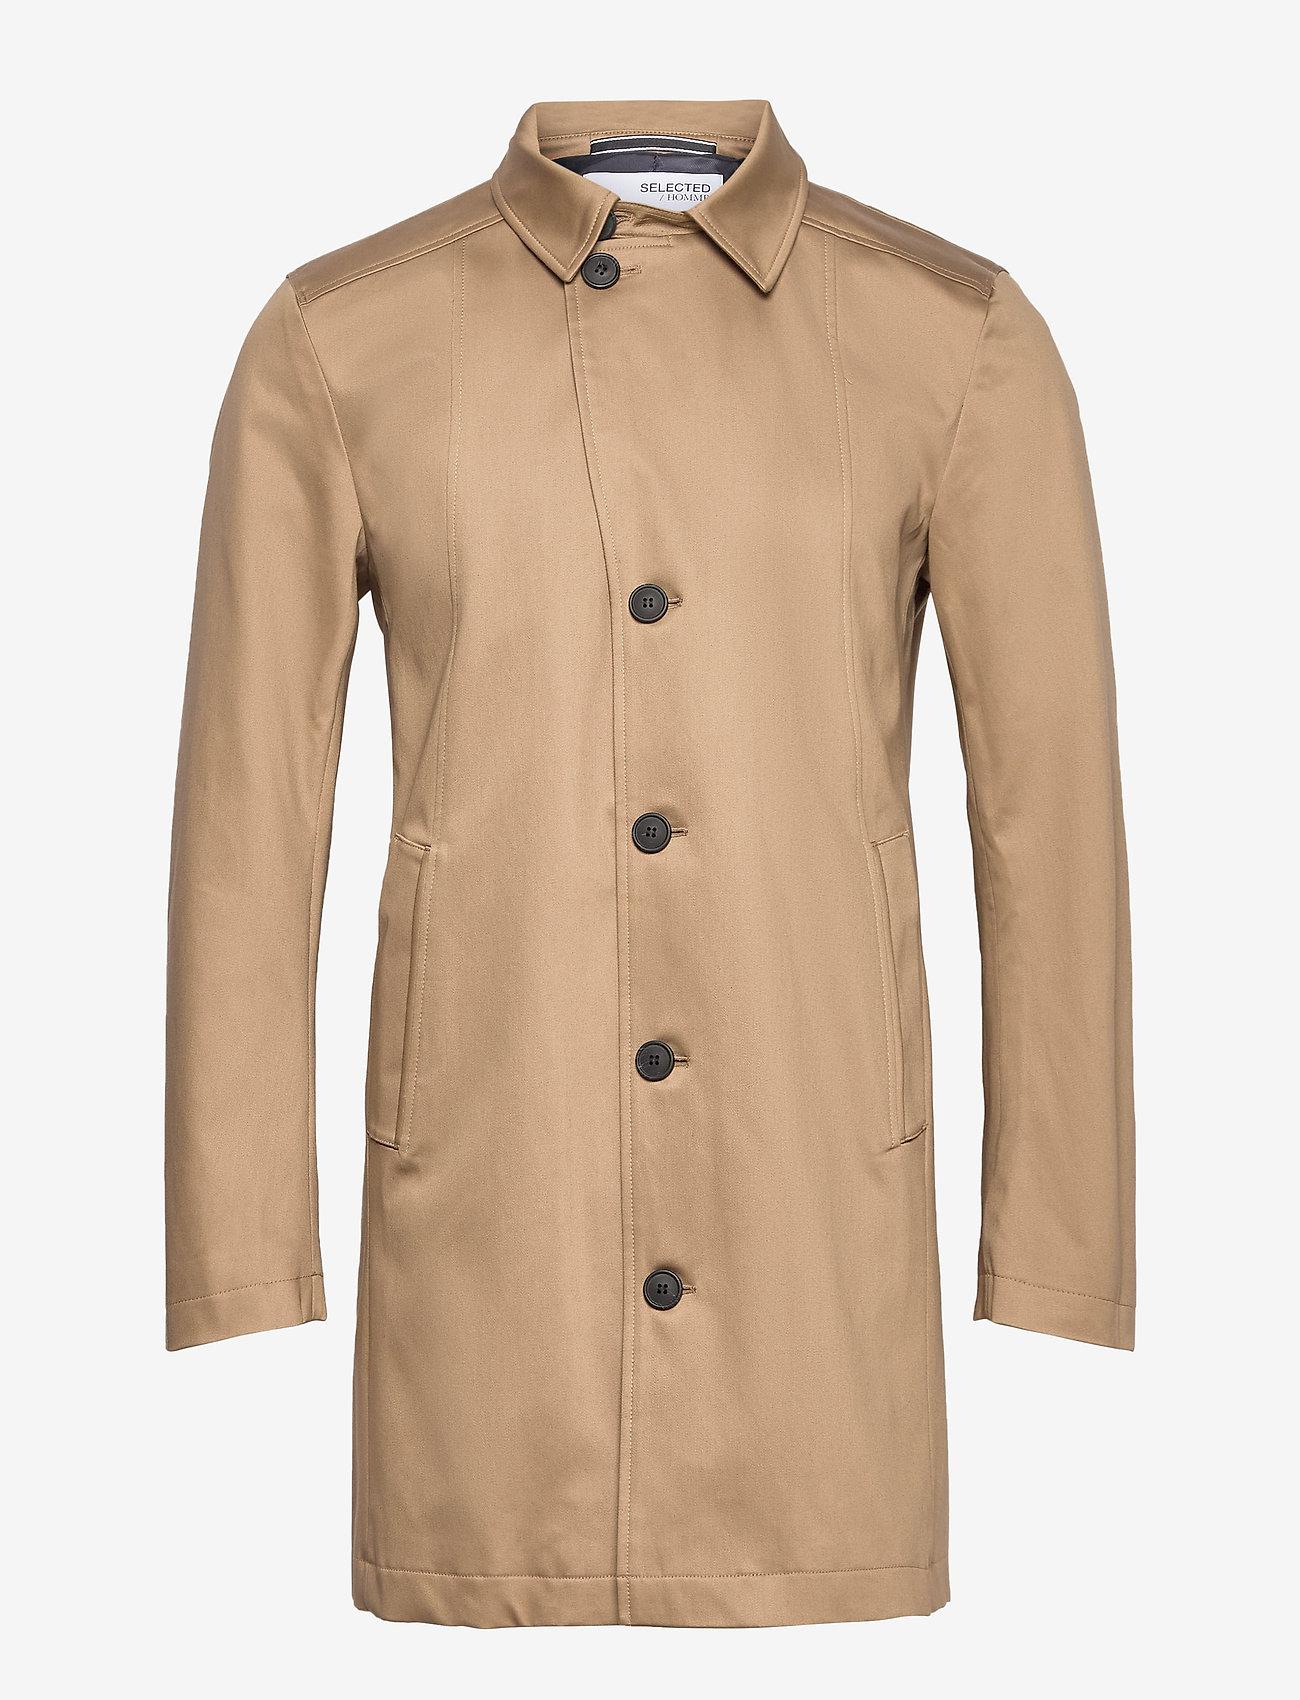 Selected Homme - SLHNEW TIMELESS COAT - manteaux legères - petrified oak - 0